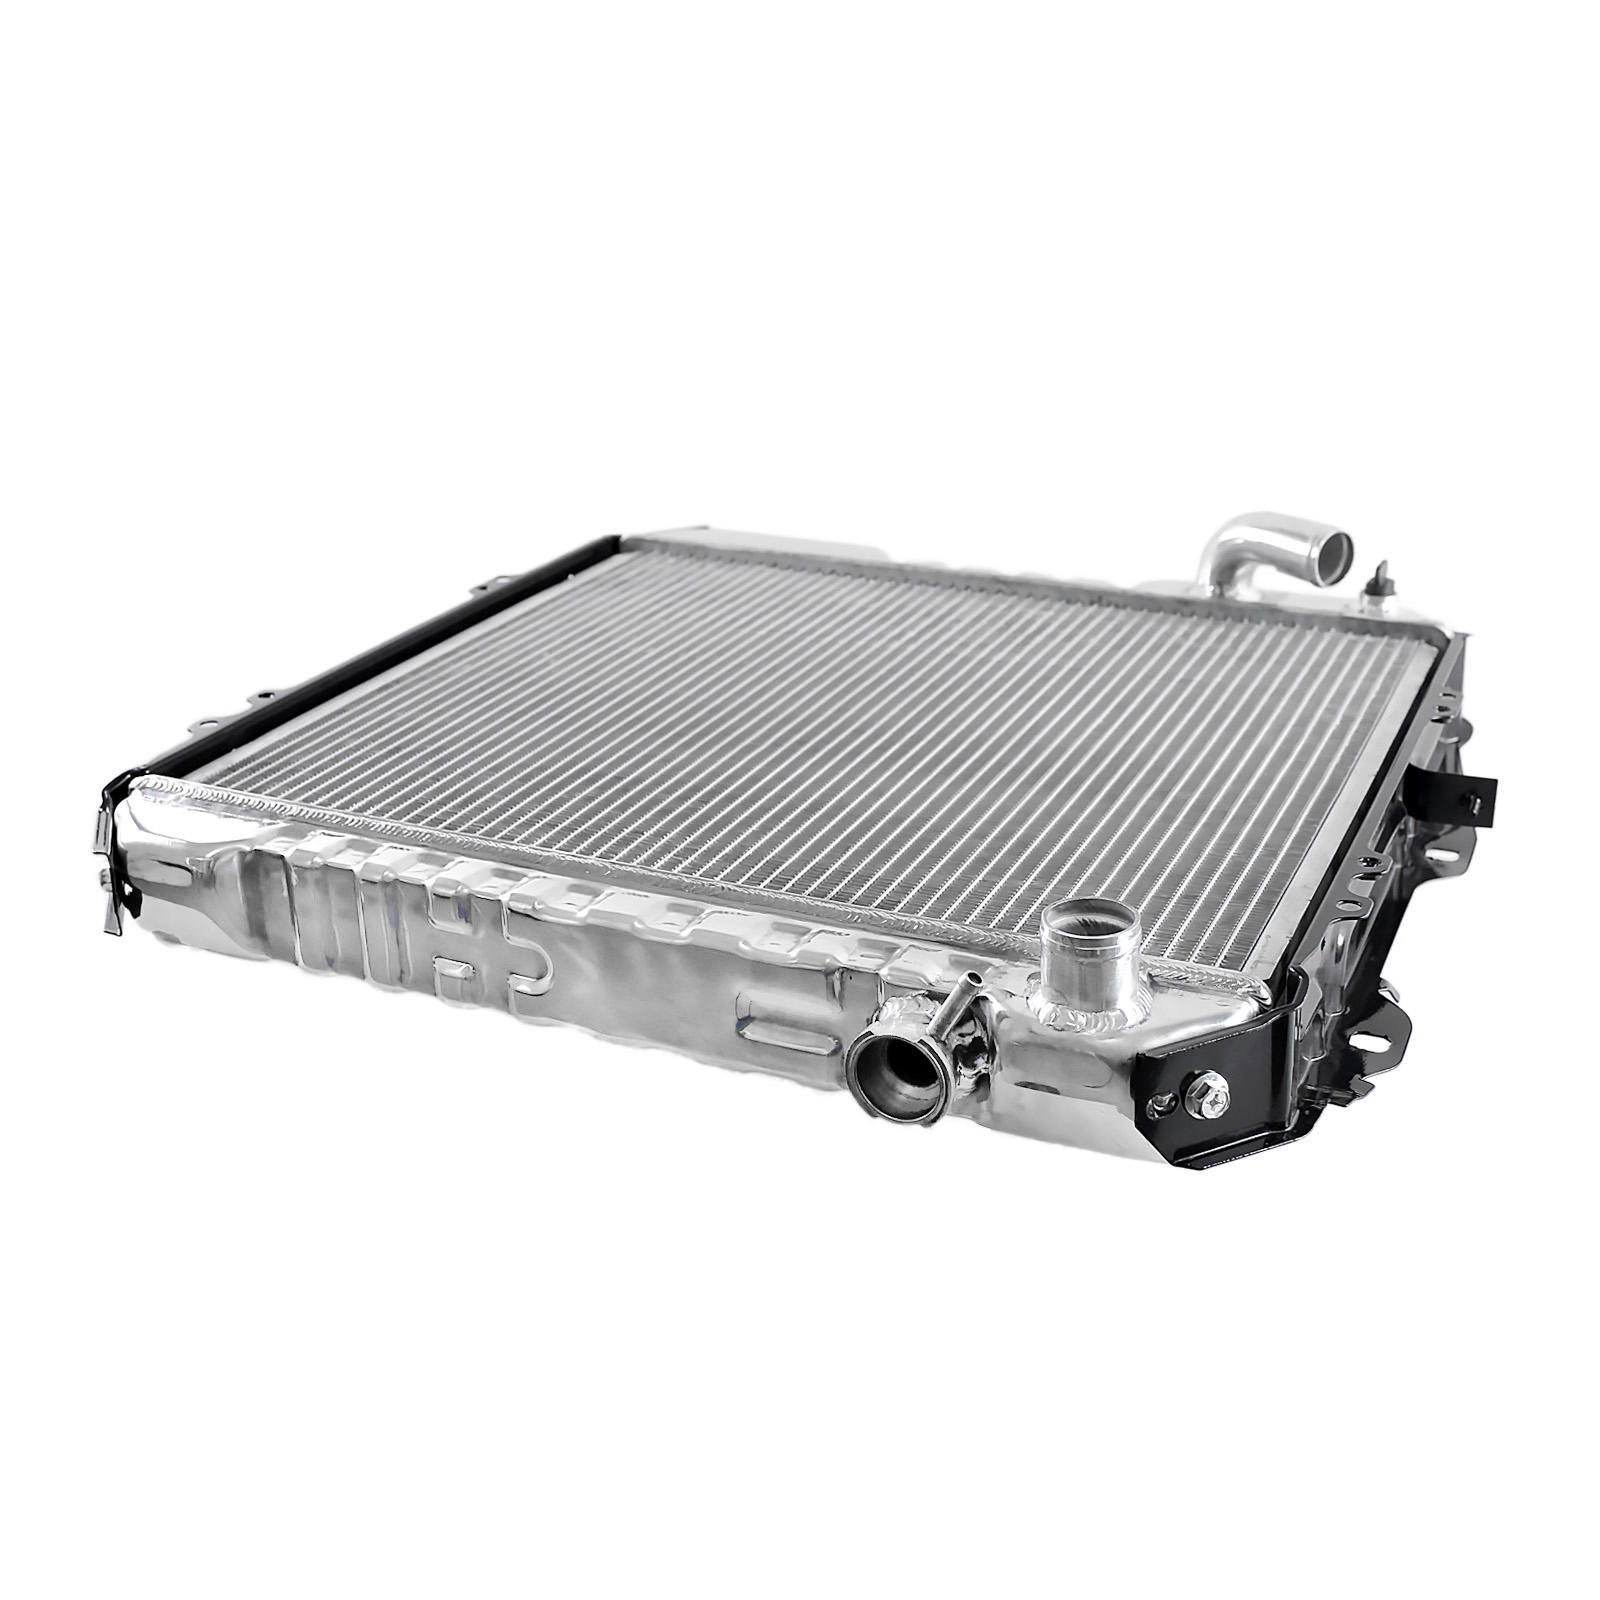 All Aluminum Radiator For Toyota Hilux LN85 LN86 2.8L 1988-1995 Manual